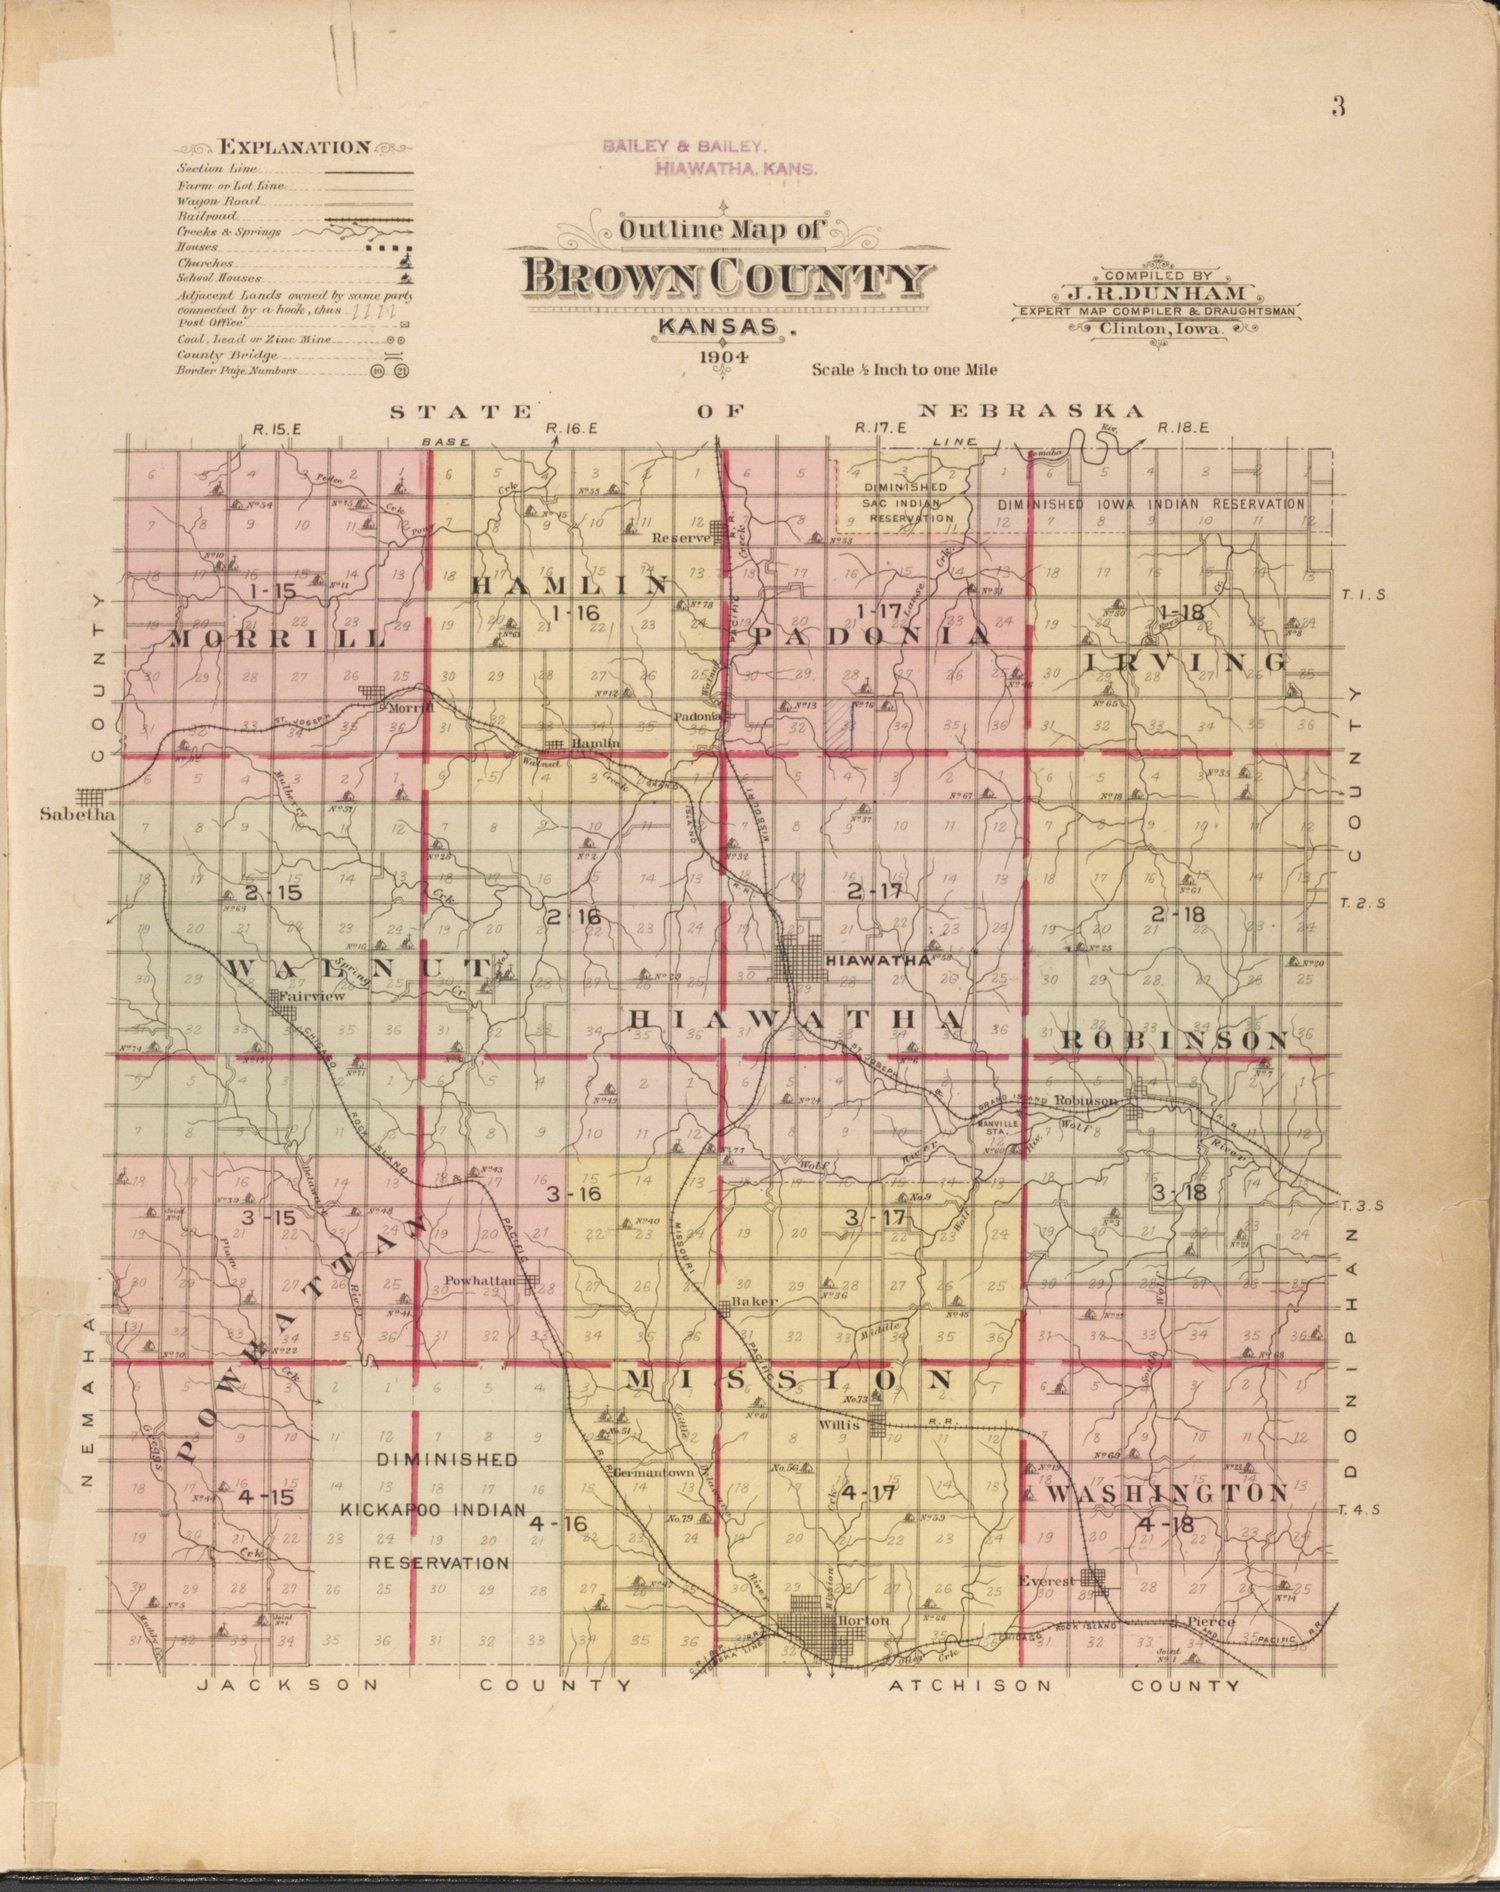 Plat book of Brown County, Kansas - 3